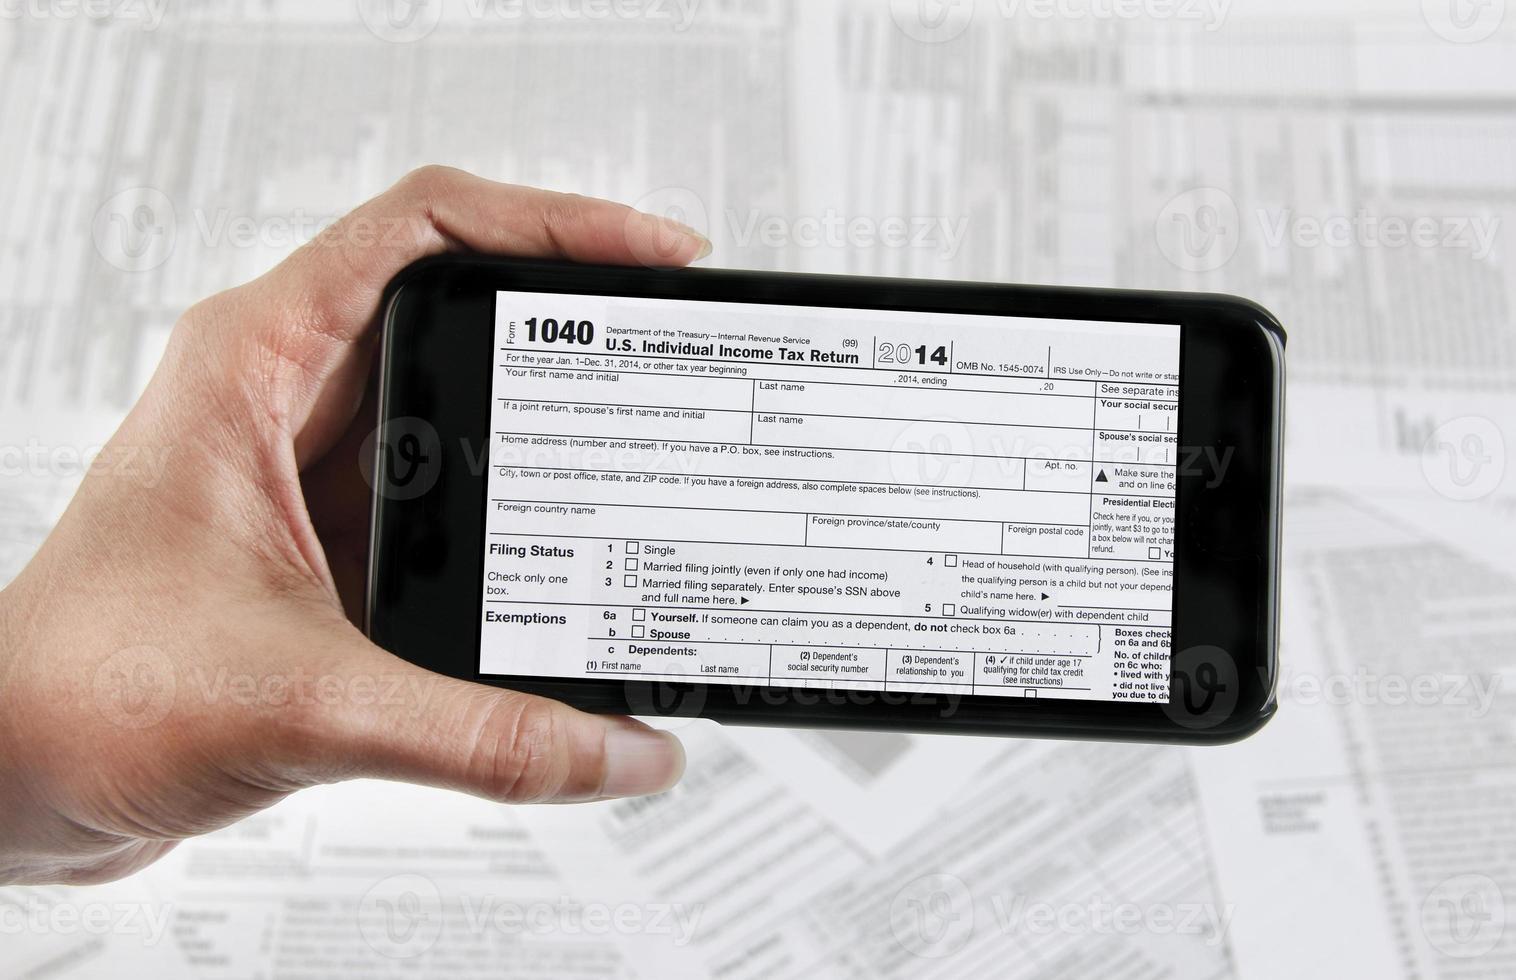 Steuer-E-Datei mit mobilem Gerät foto